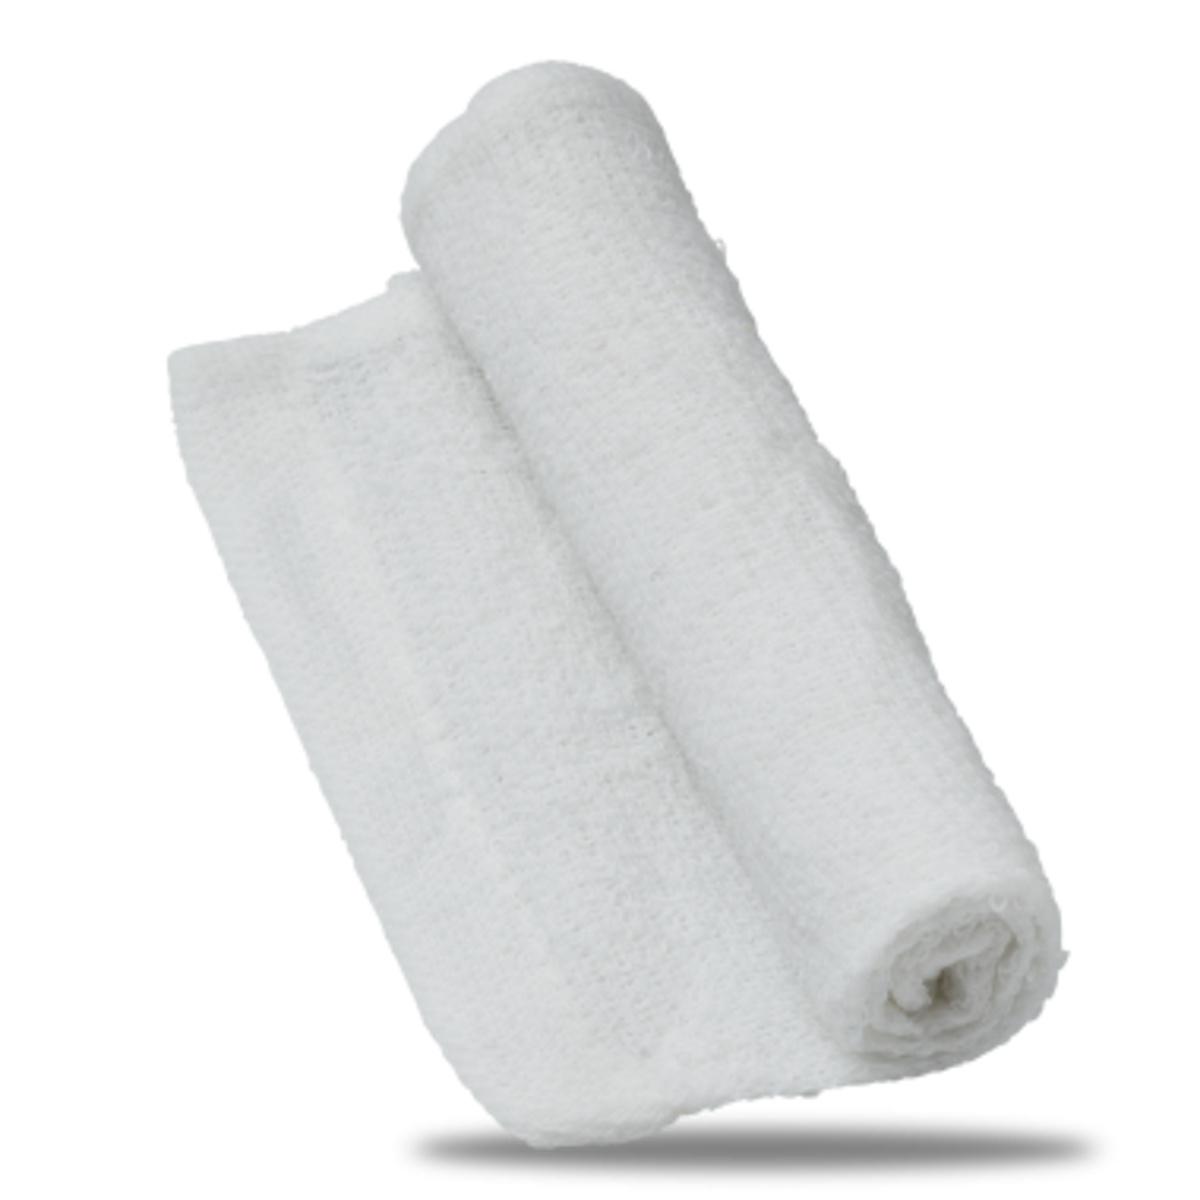 Carton 300 serviettes oshibori blanc tissu 13,20x17,70 cm Oshibori (300 pièces)